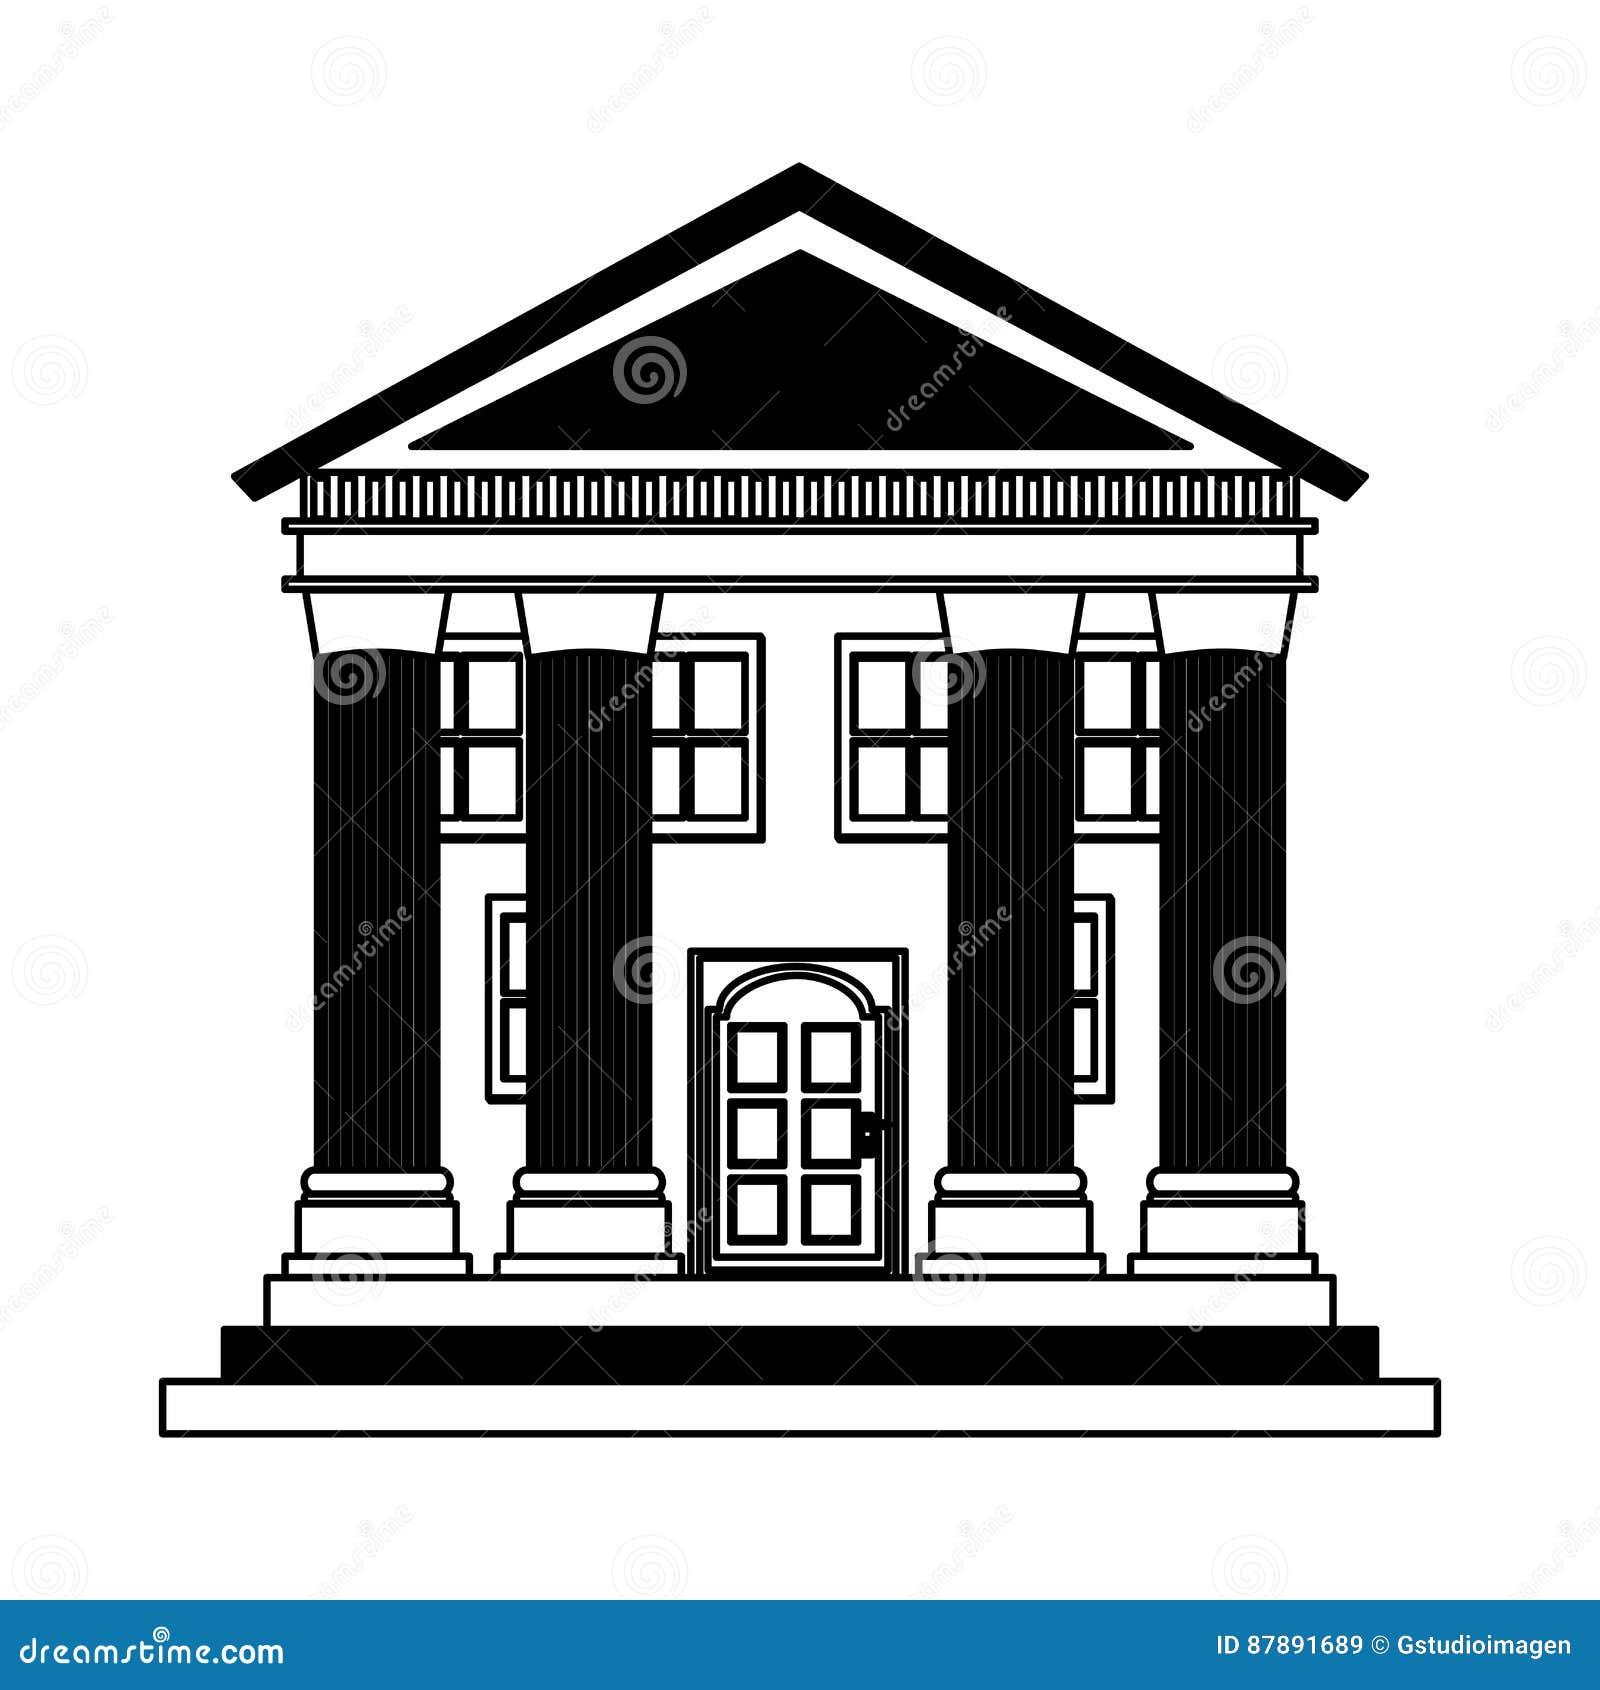 Building roman columns icon